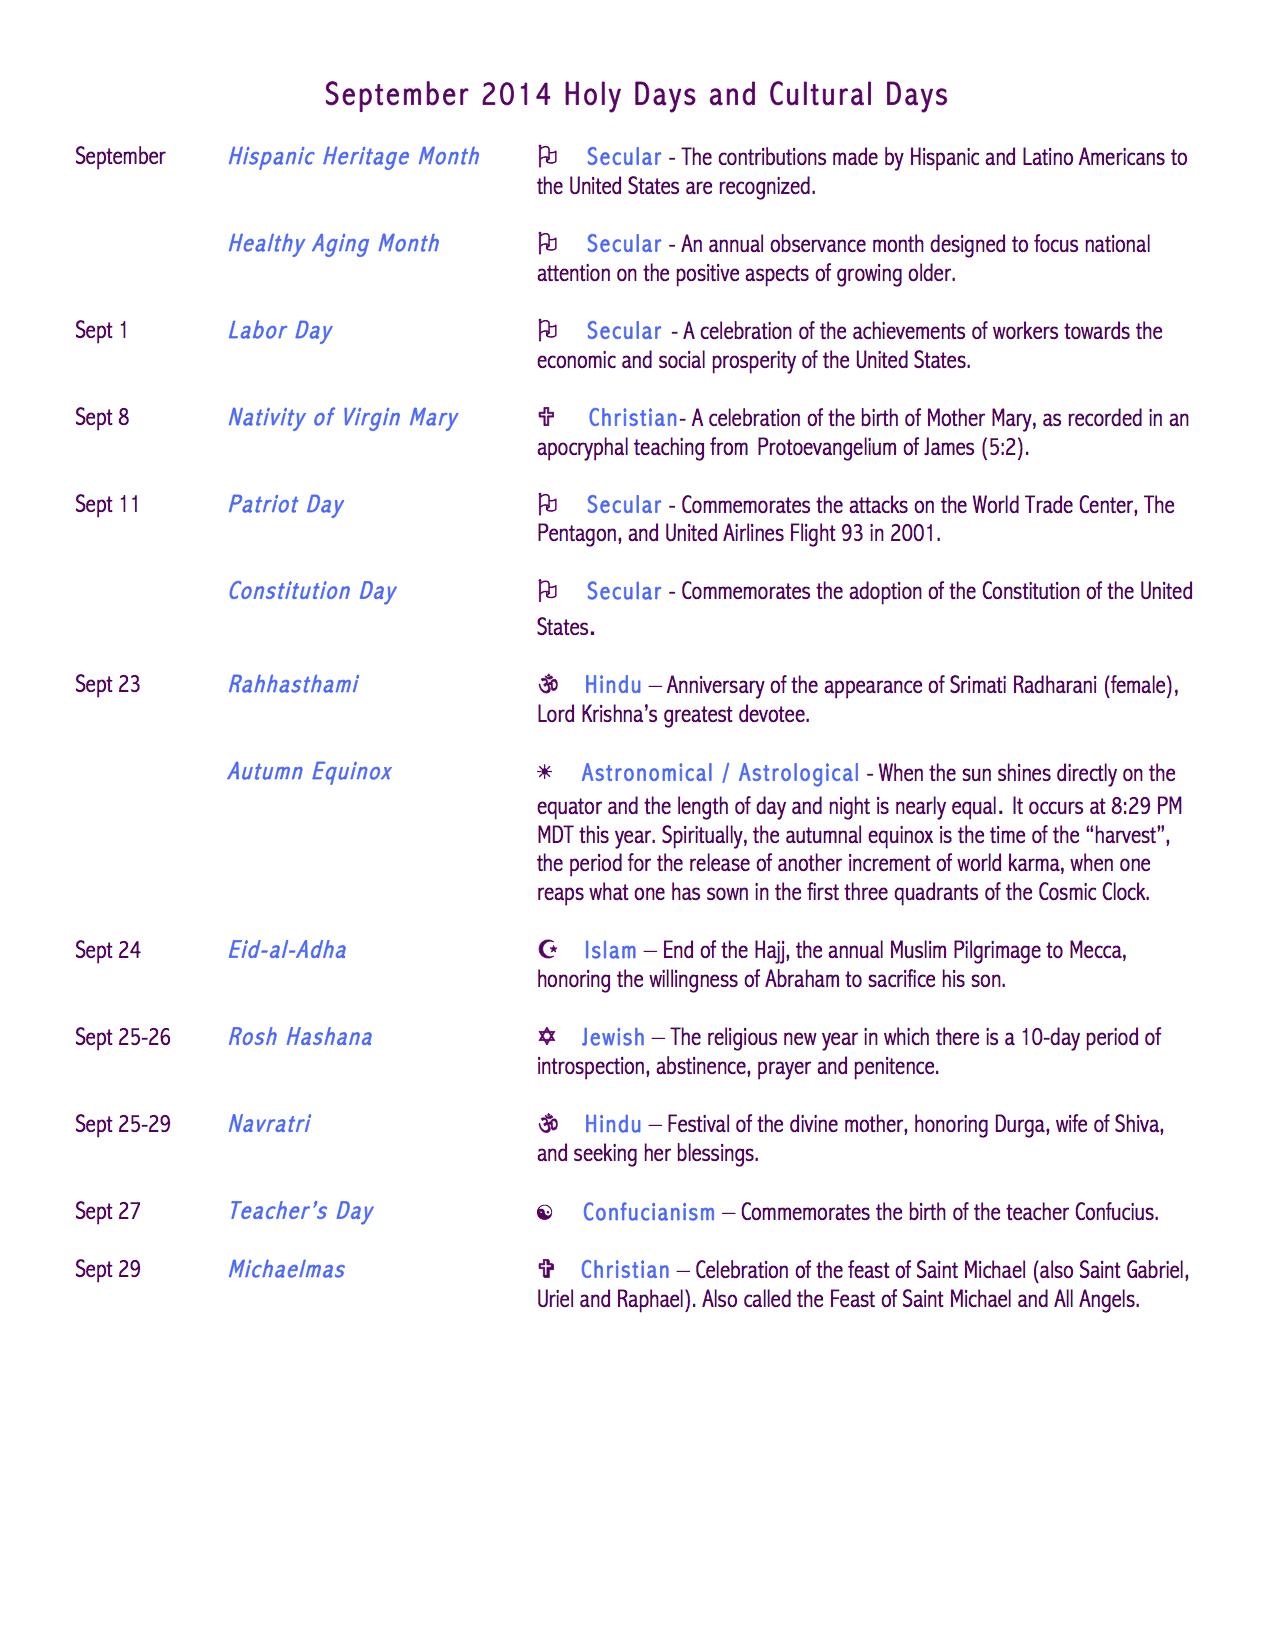 September Holidays Observances Calendar Autos Post